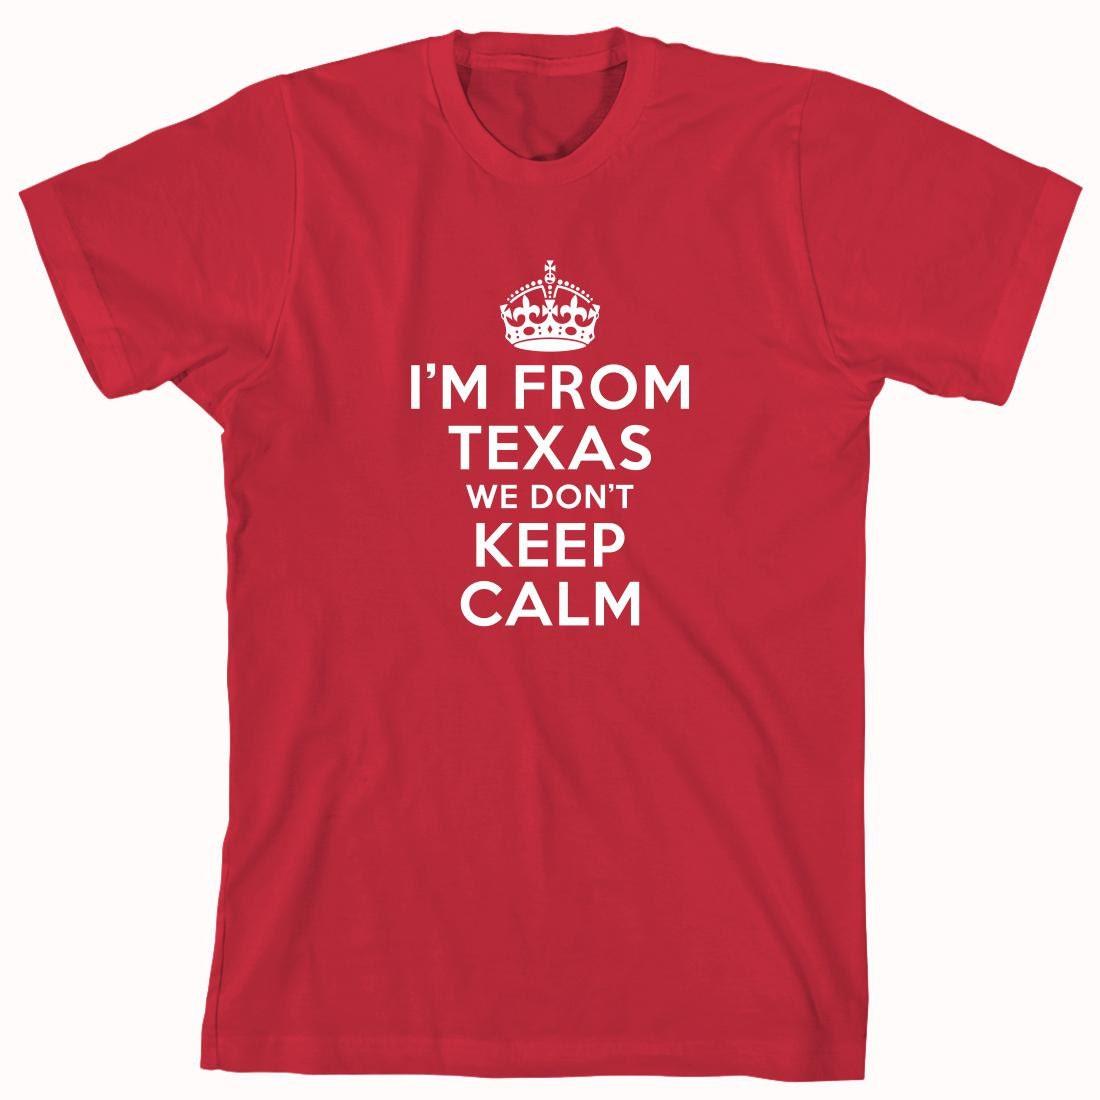 I'm From Texas We Don't Keep Calm Shirt texas shirt